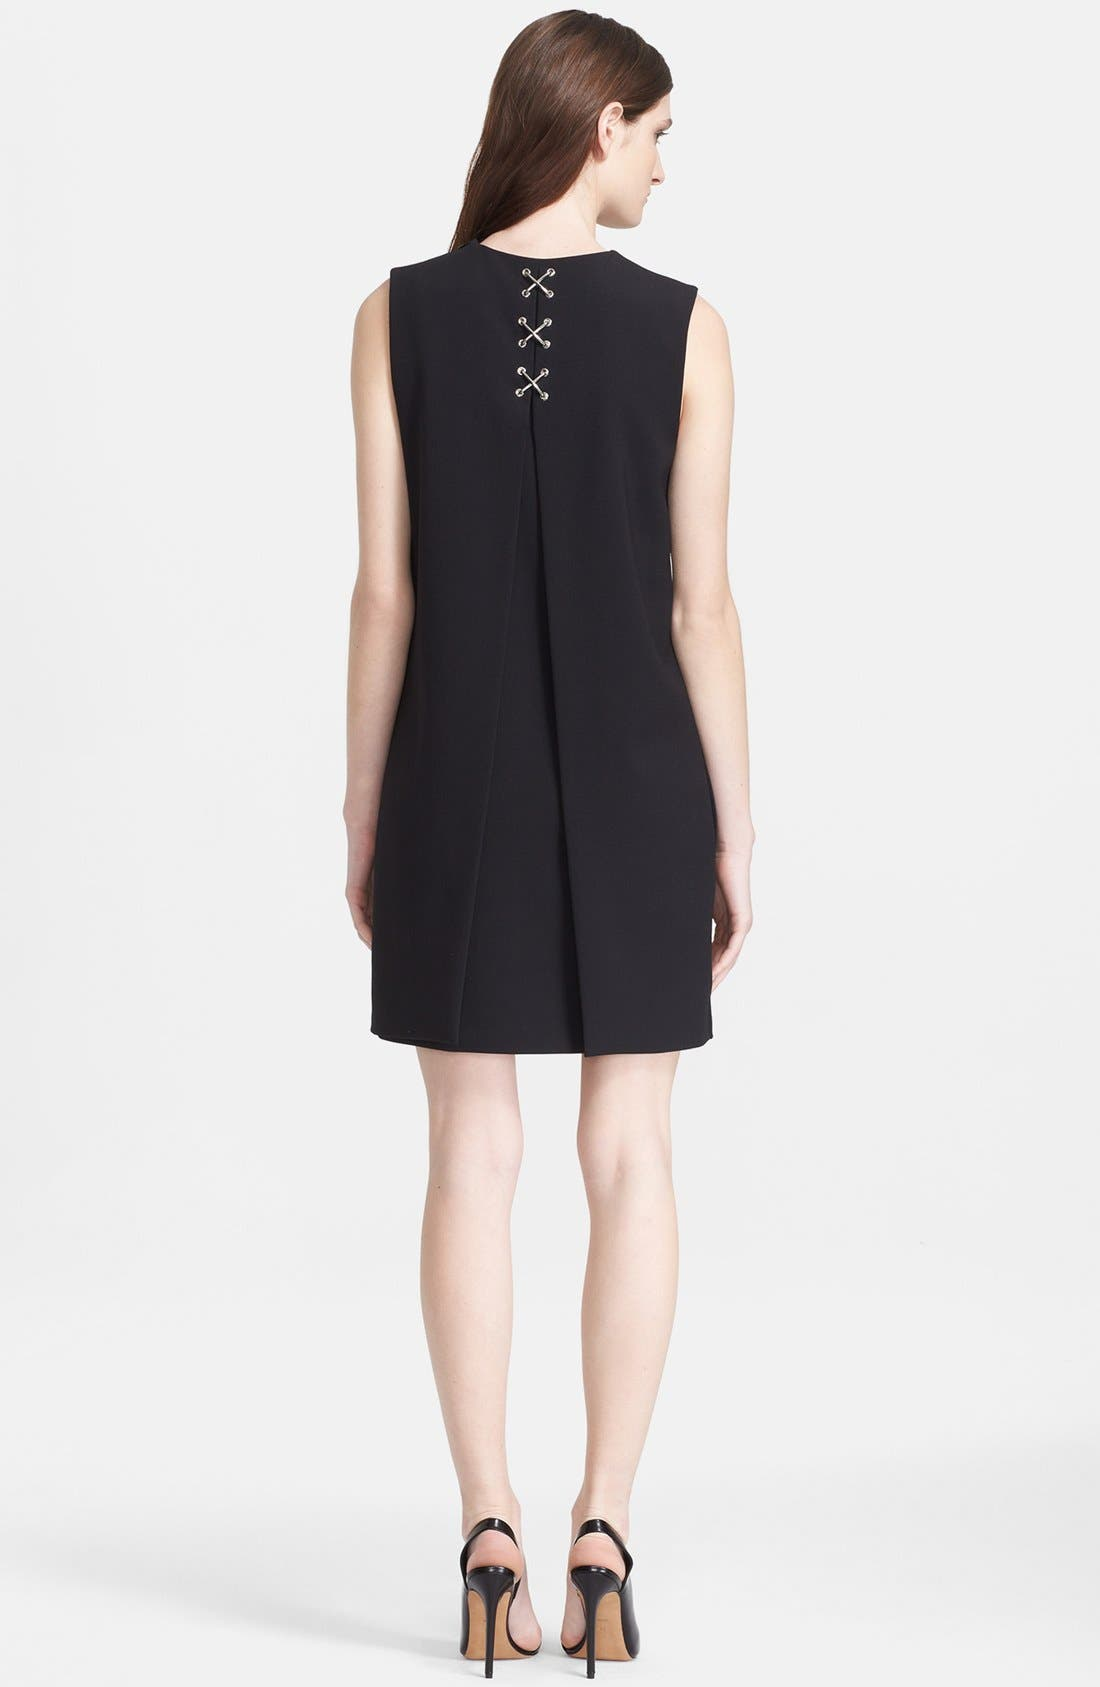 Alternate Image 1 Selected - Alexander Wang Lace-Up Back Folded Dress